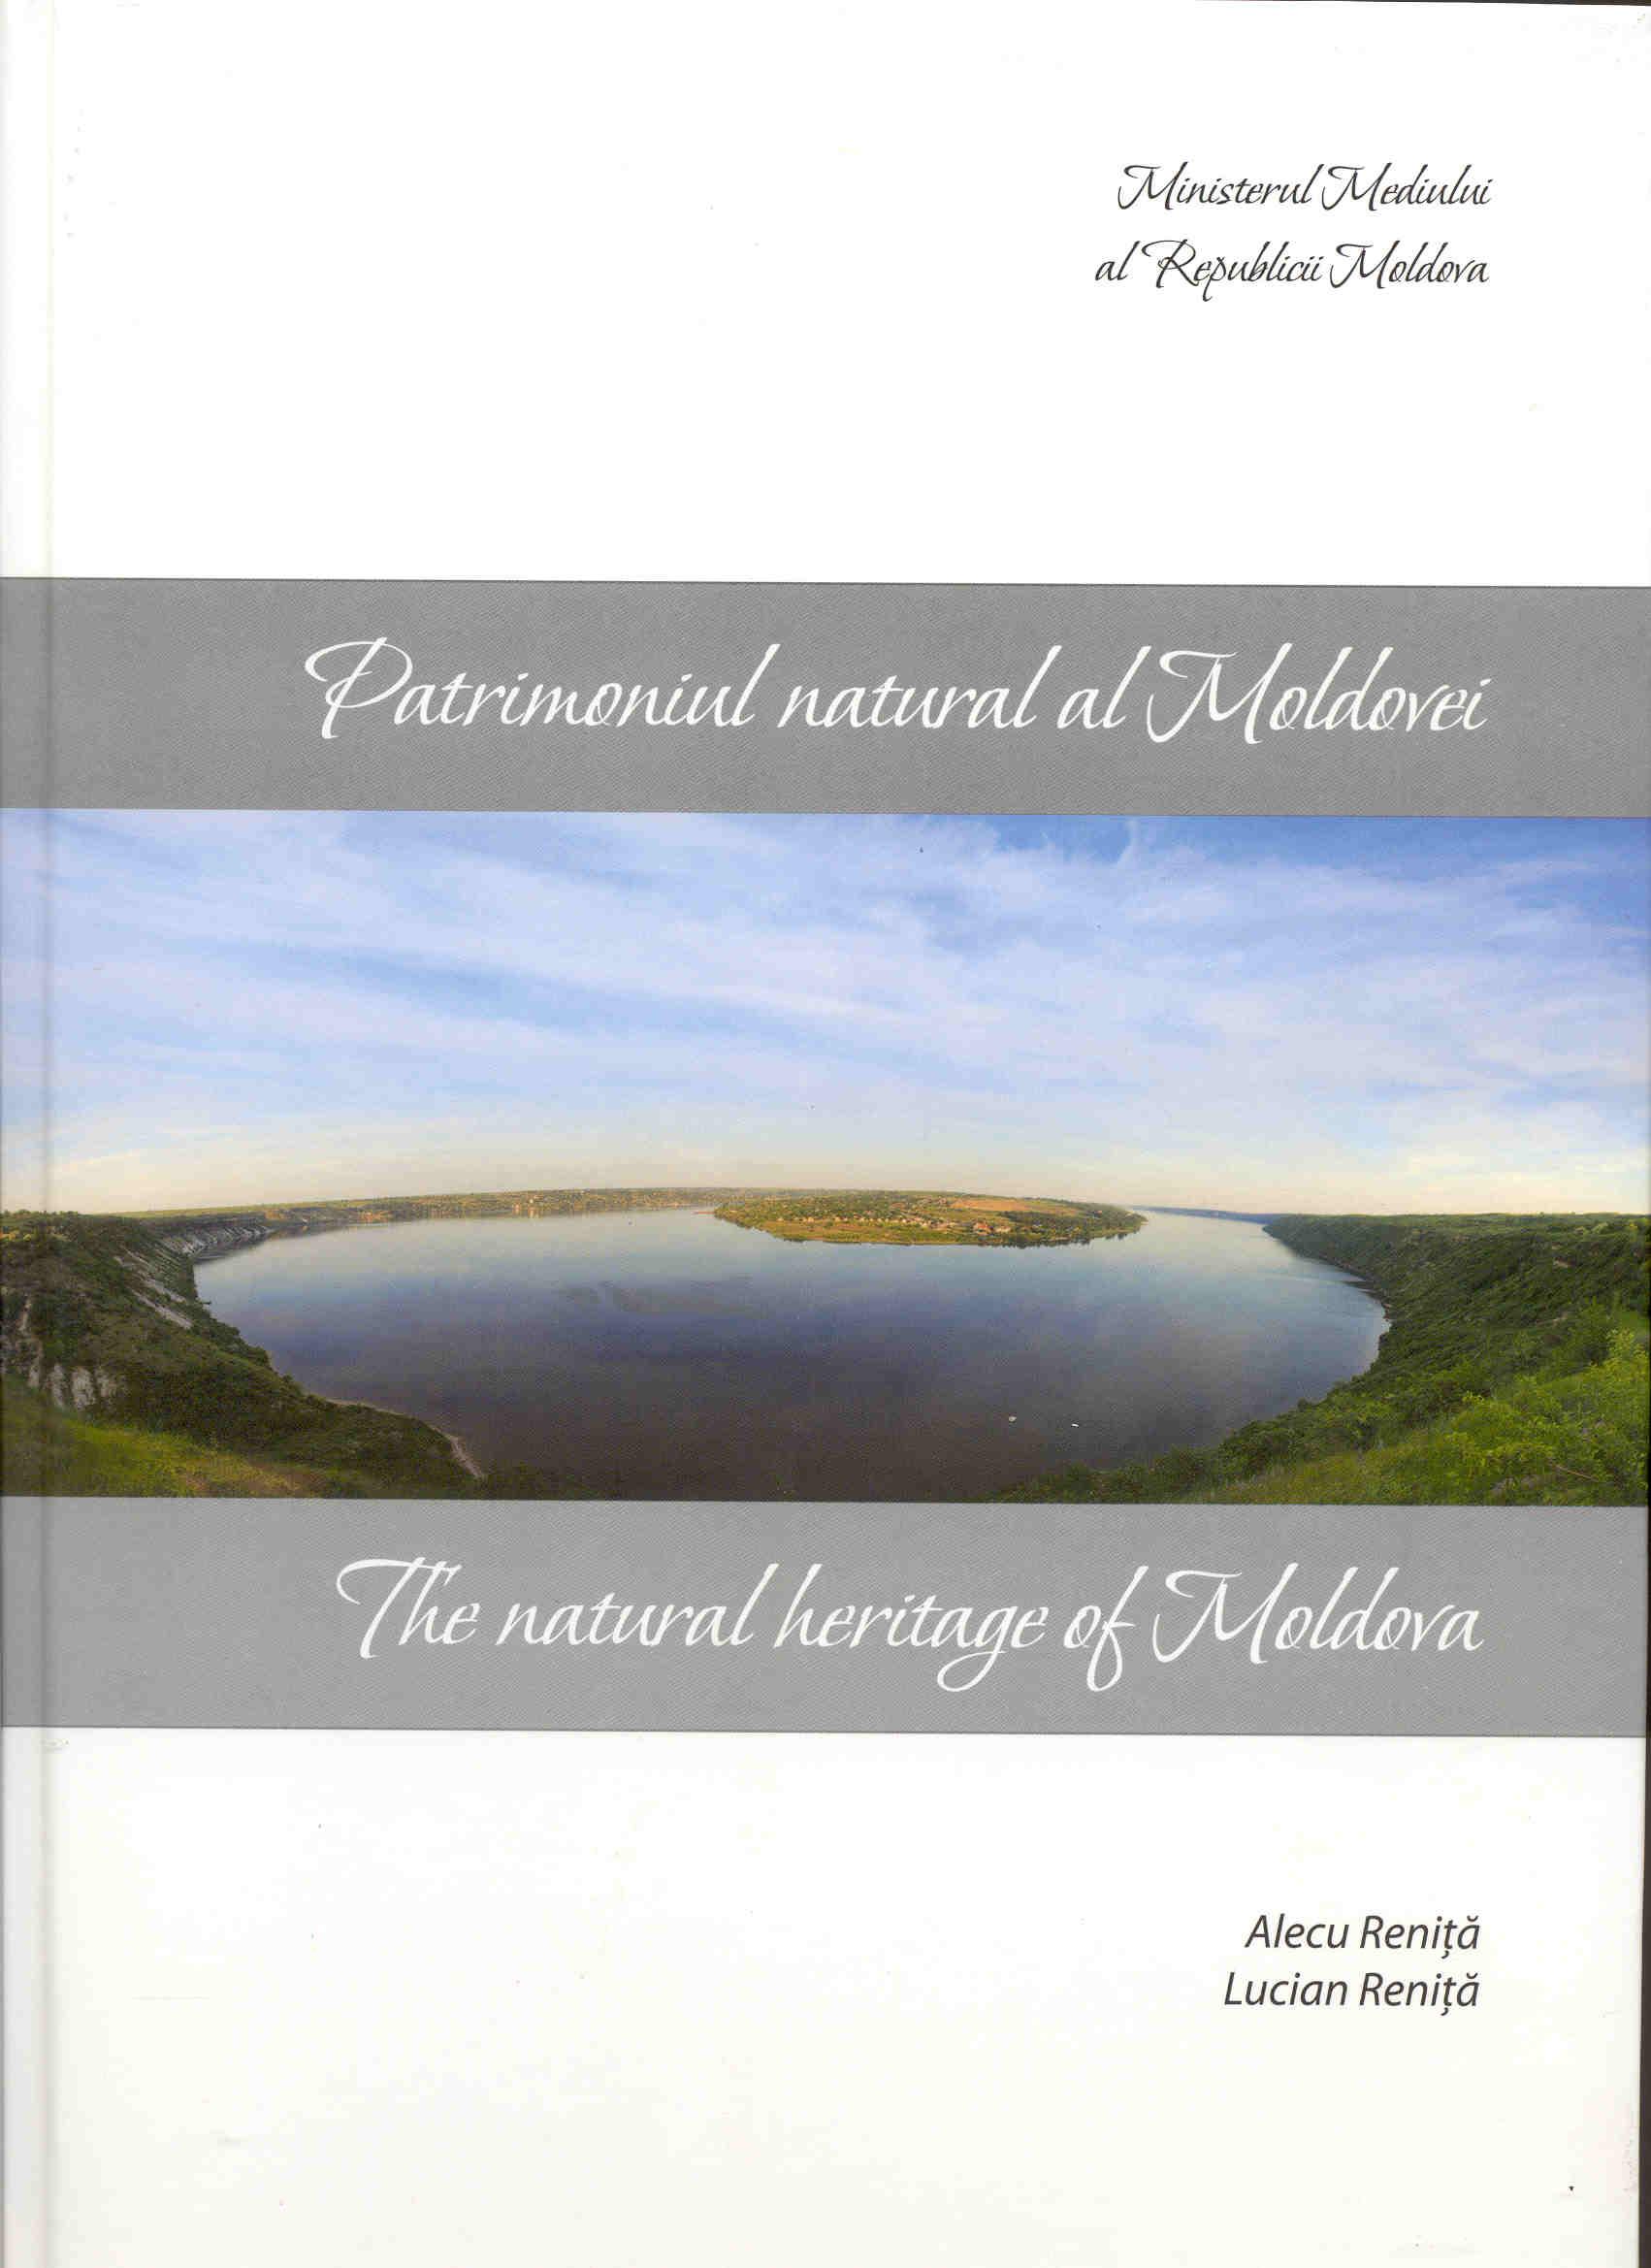 Patrimoniul natural al Moldovei